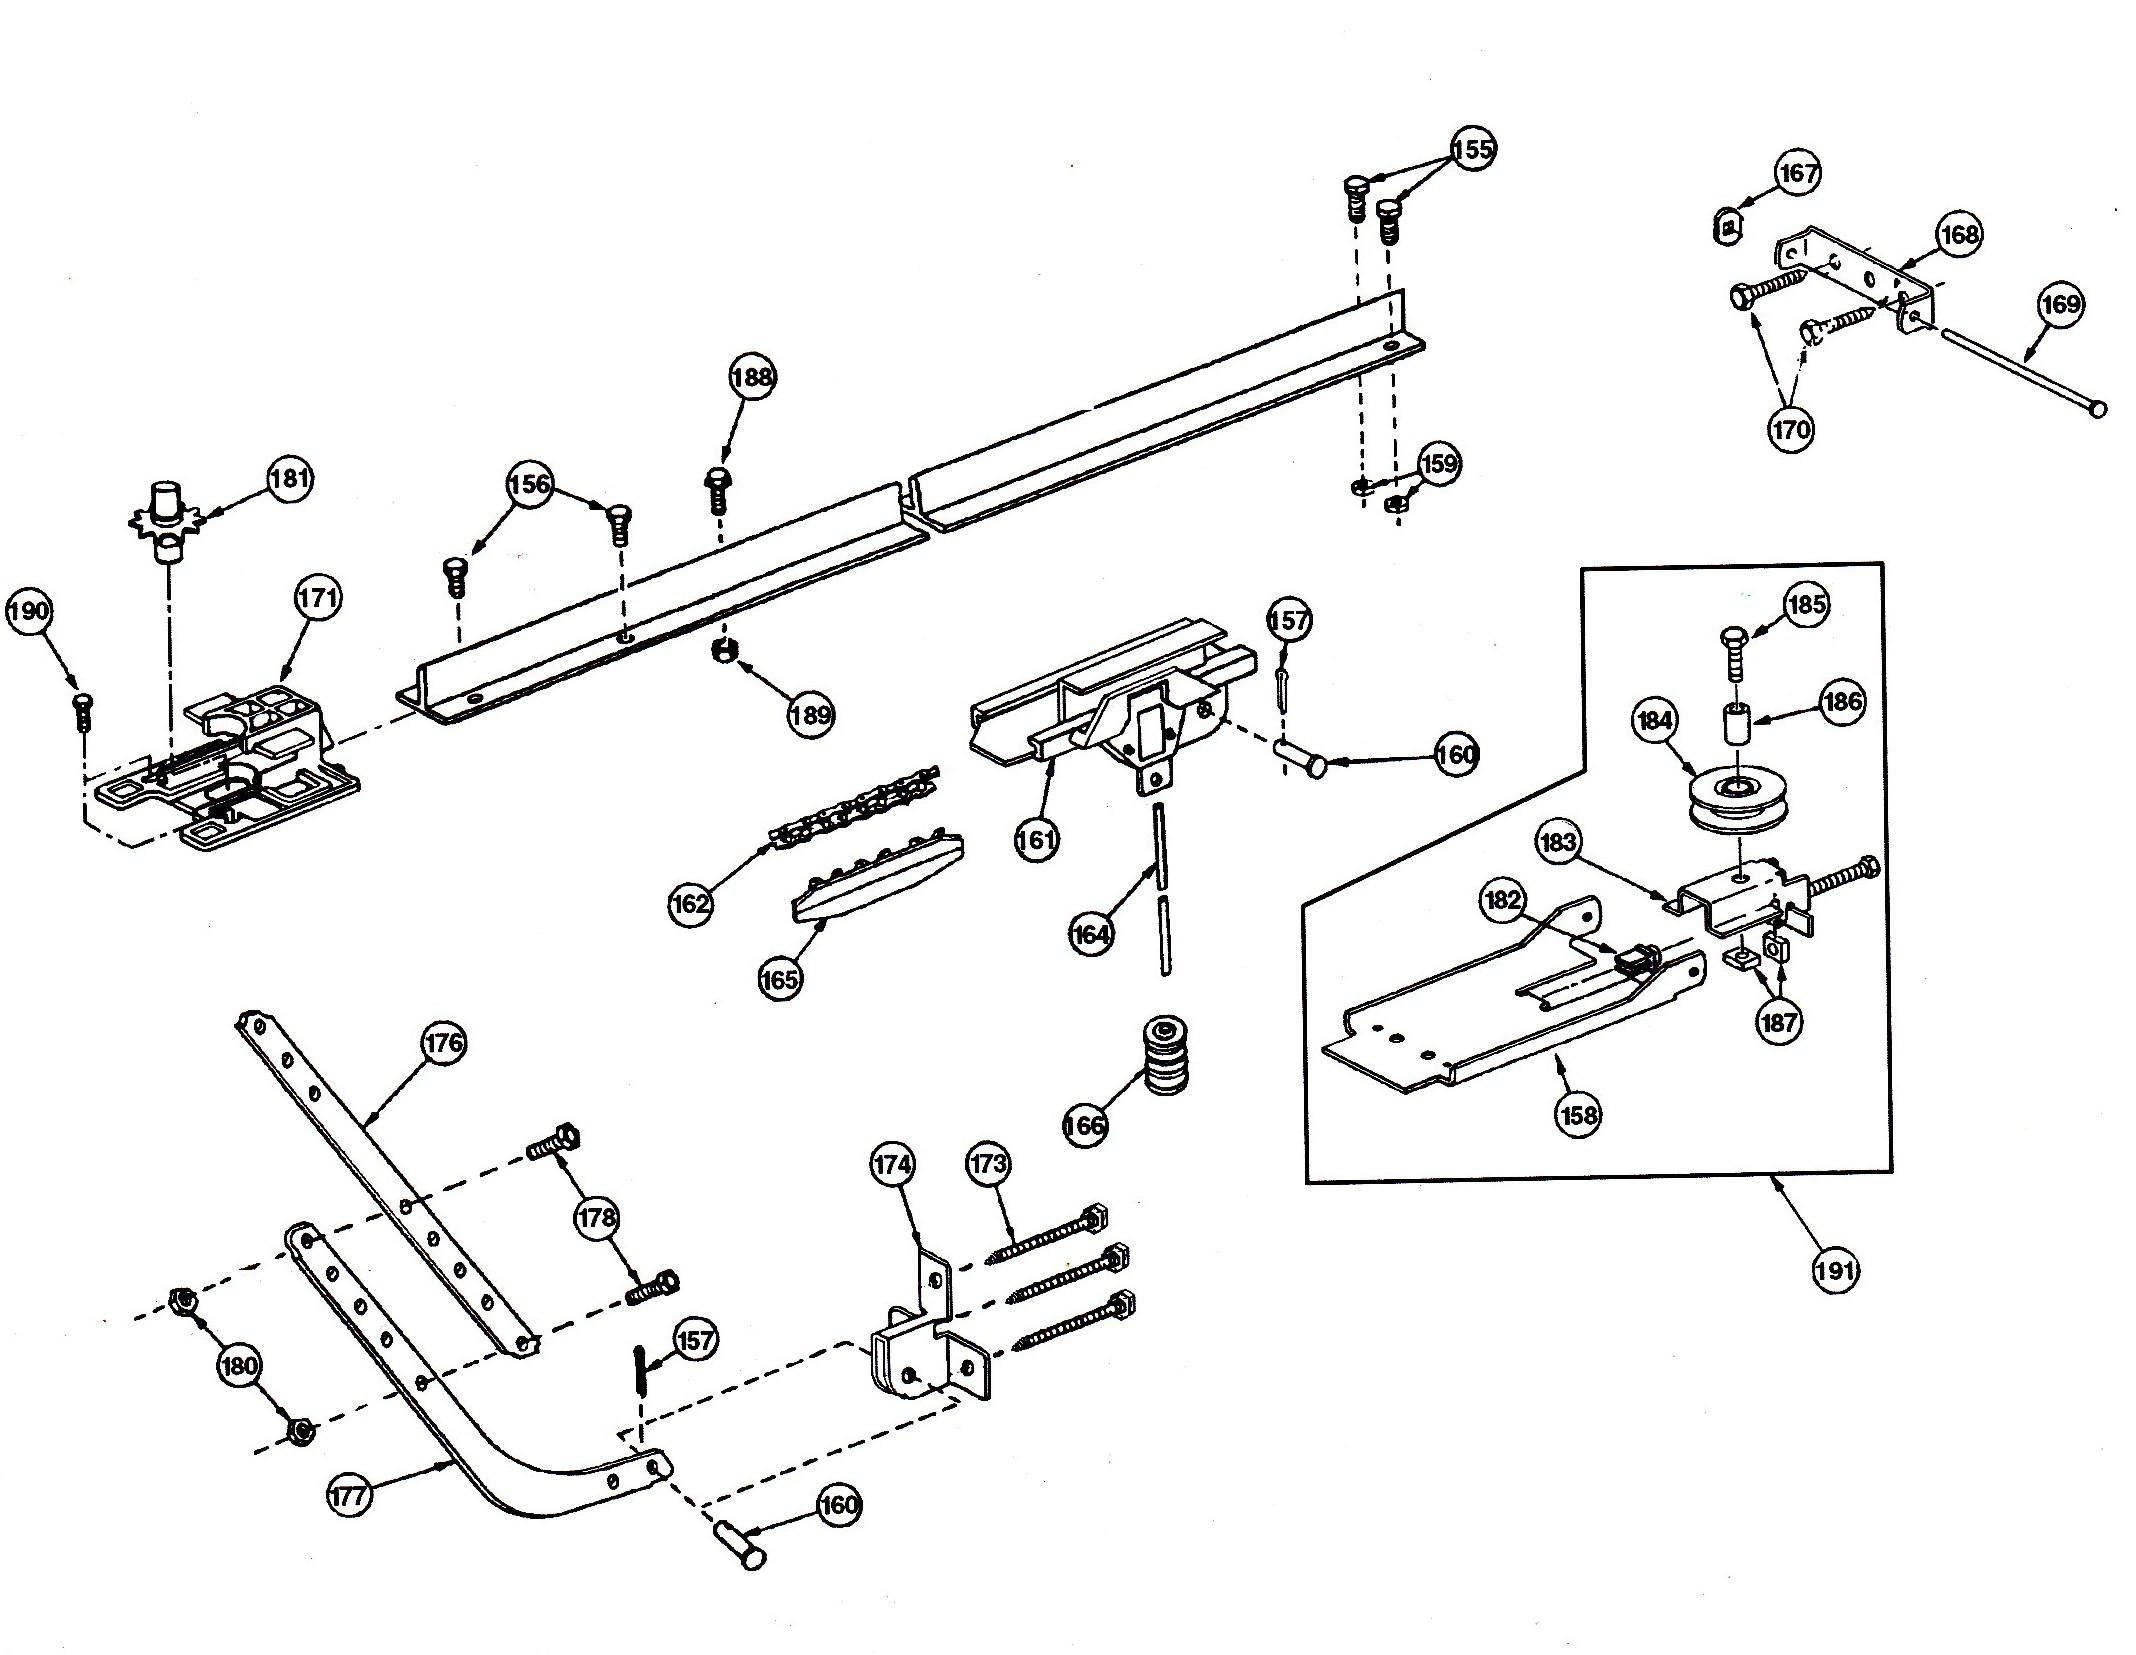 wiring diagram overhead door company diagram free printable wiring diagrams